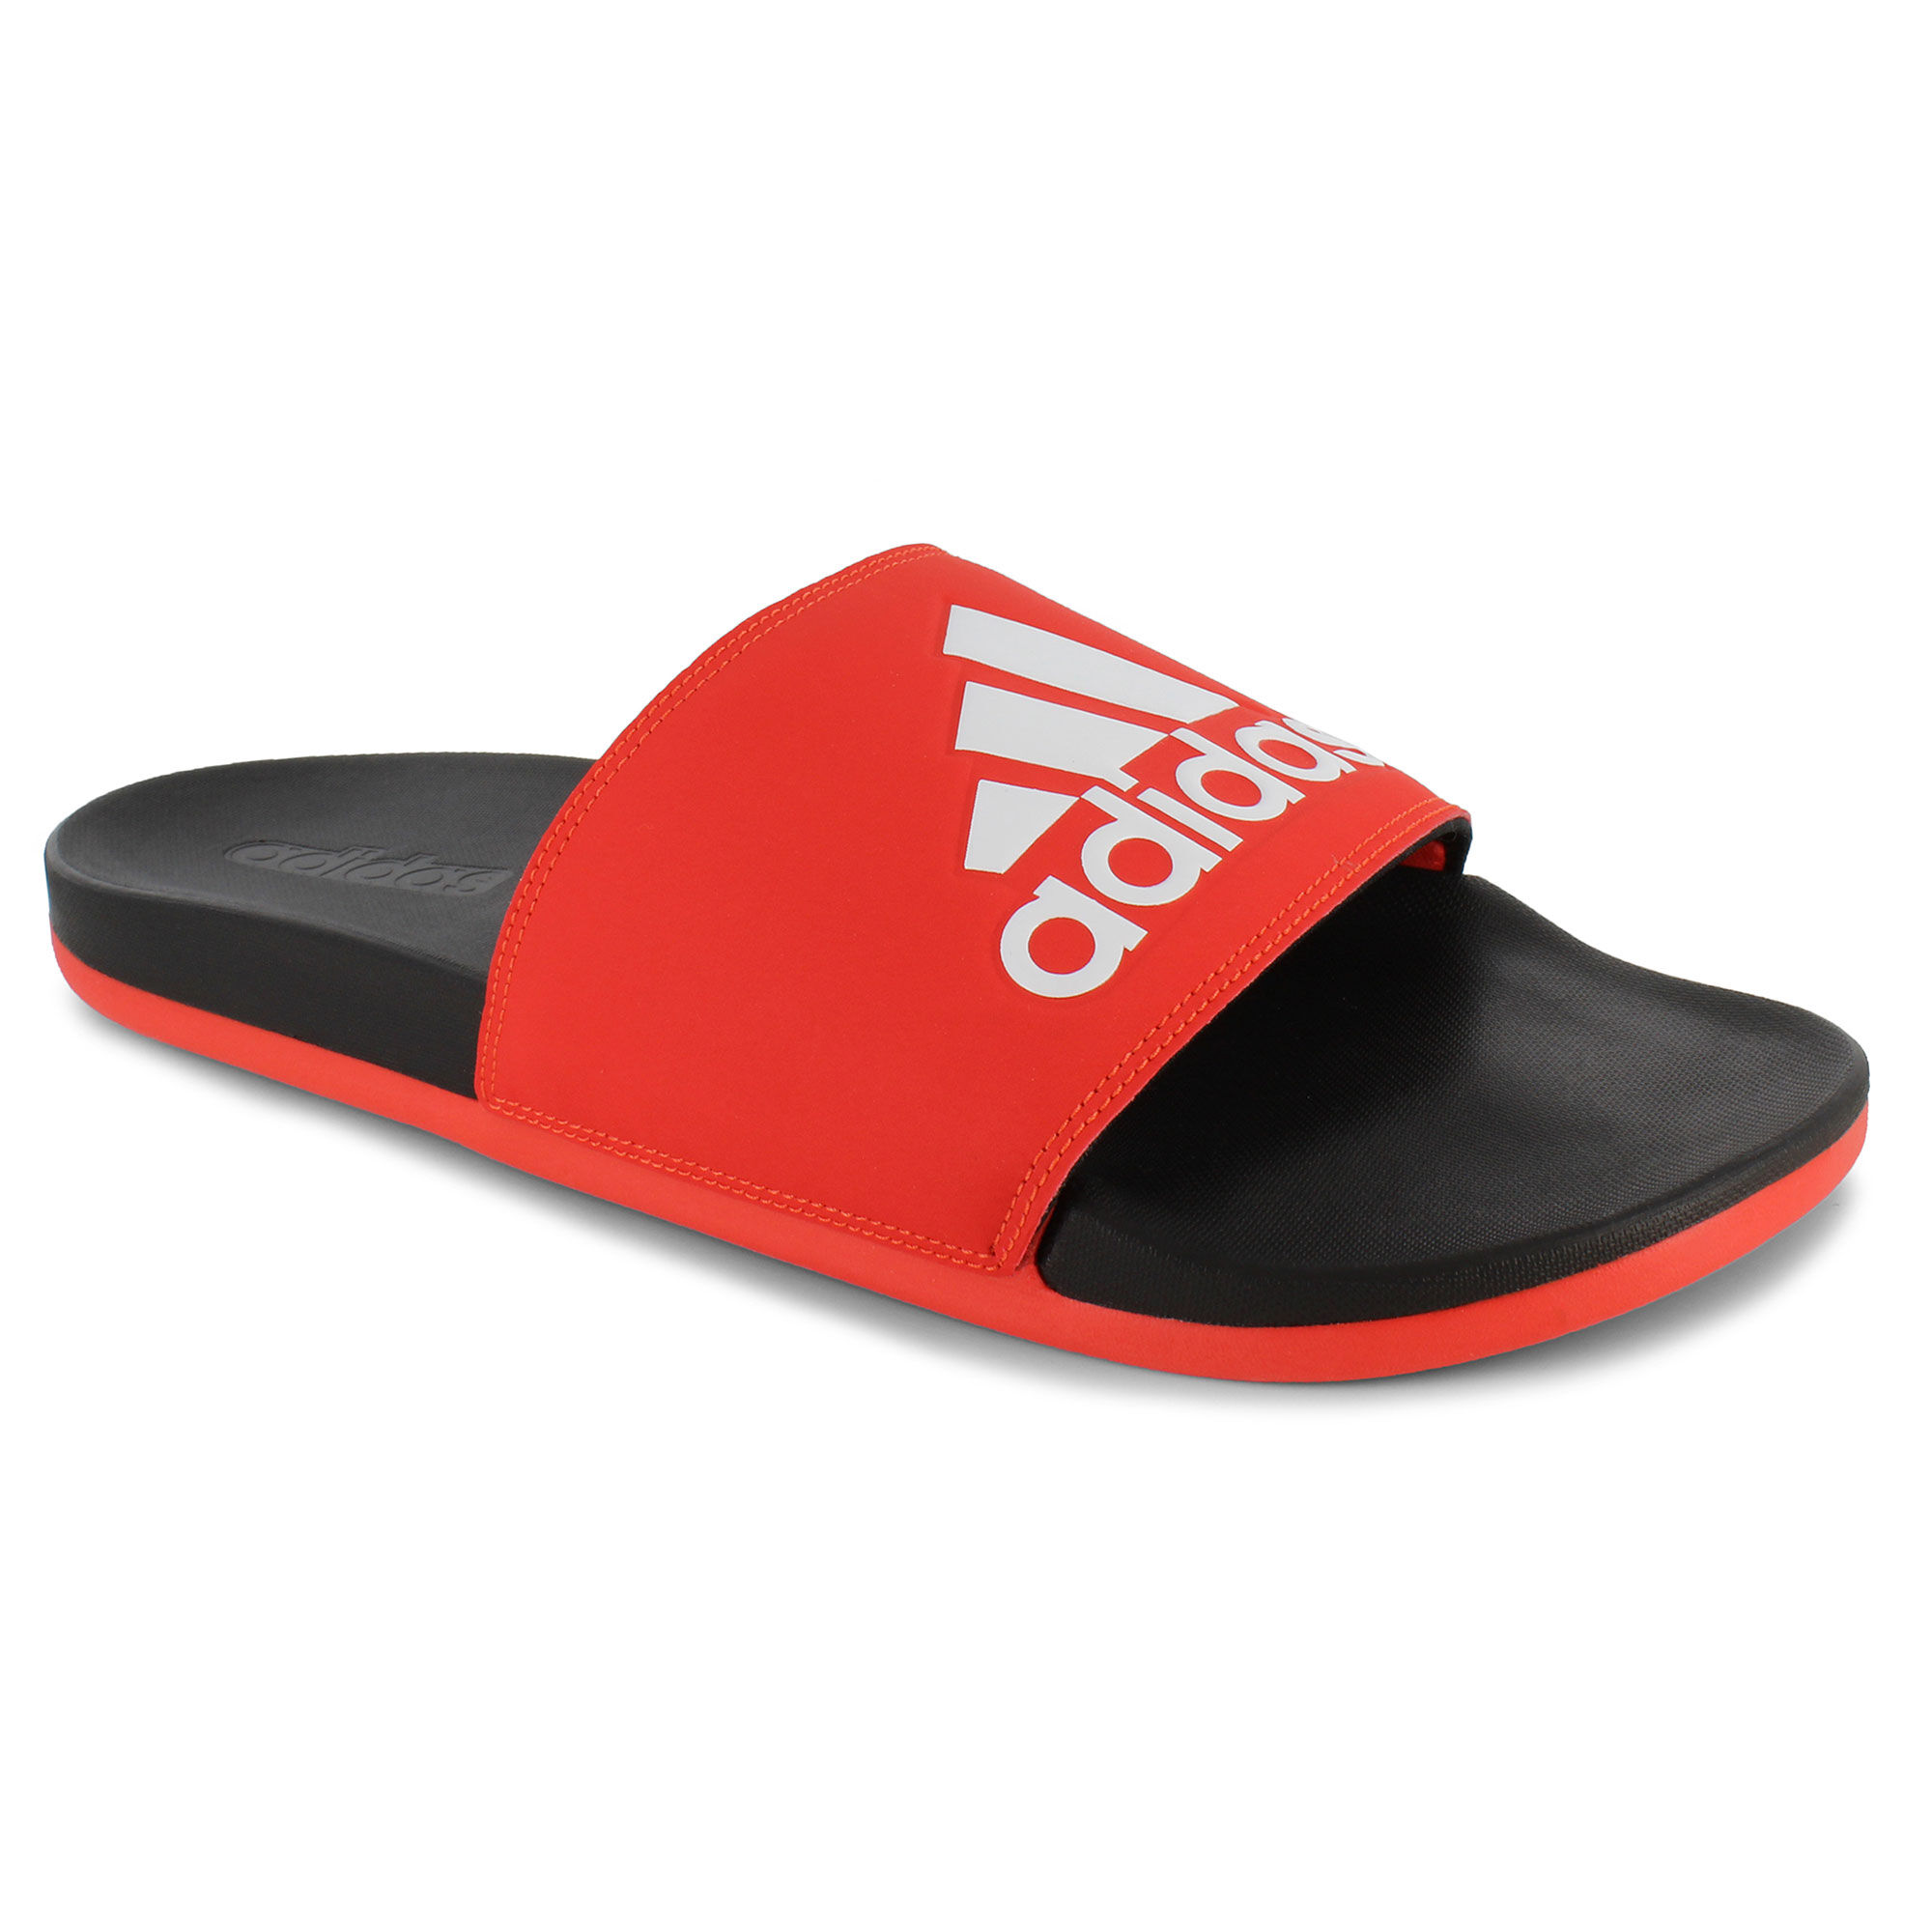 adidas cloudfoam slides red